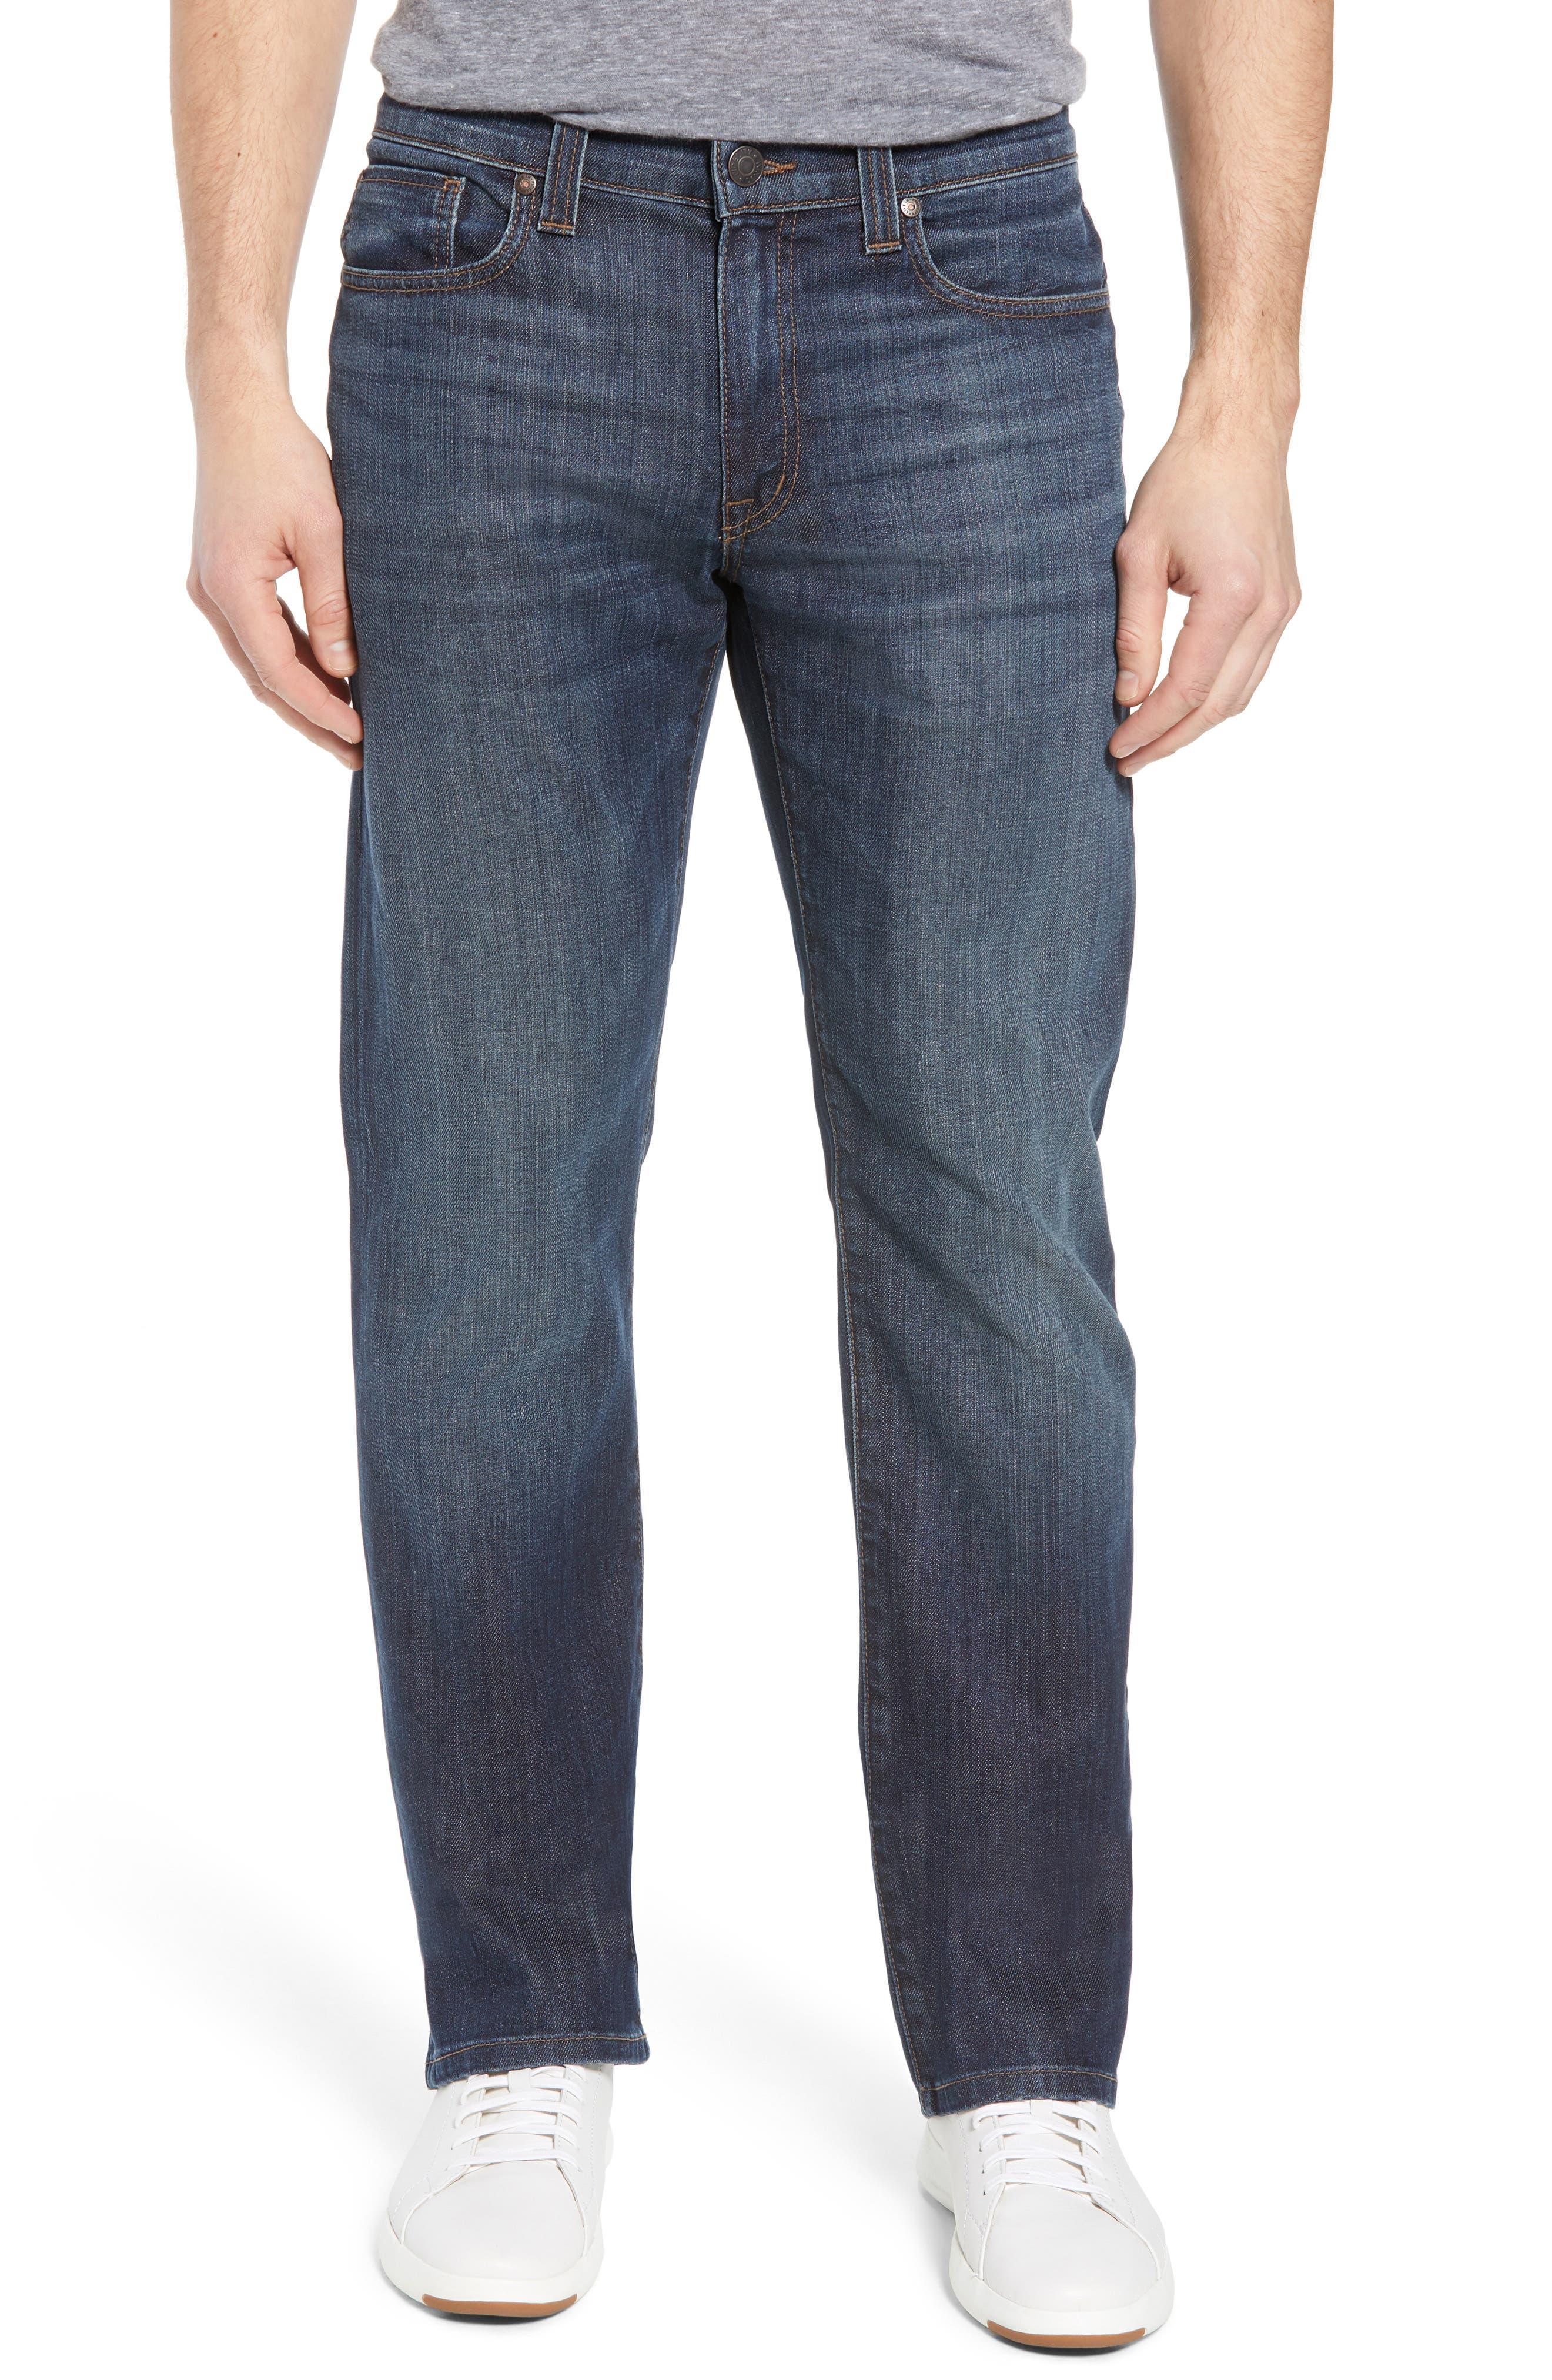 Fidelity Denim 50-11 Relaxed Fit Jeans (Windwood Vintage)